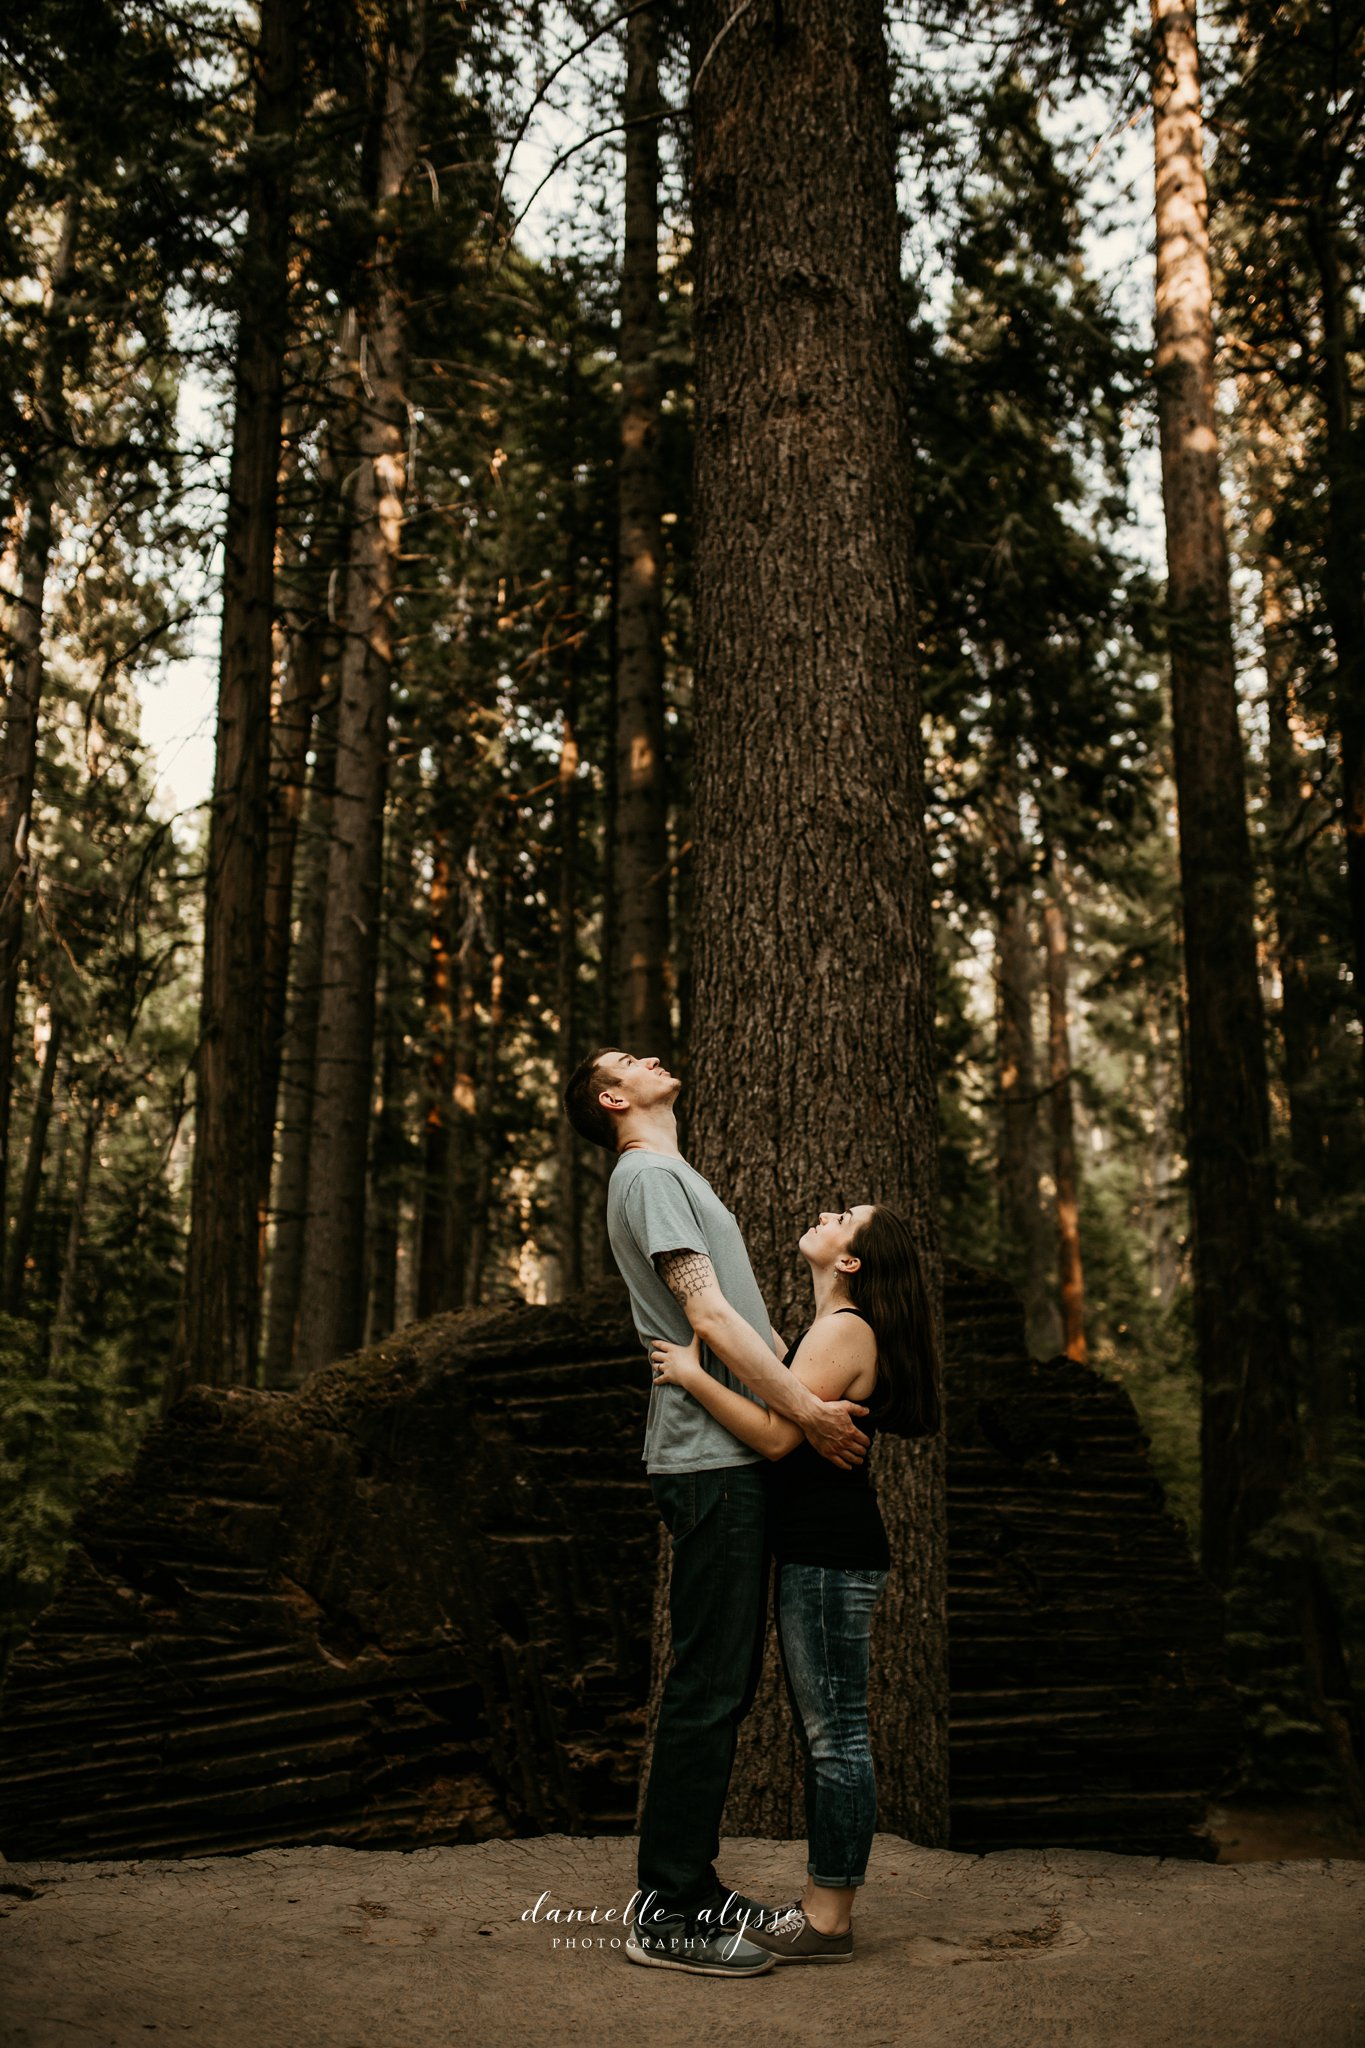 180811_engagement_kathryn_calvaras_big_trees_park_arnold_danielle_alysse_photography_blog_58_WEB.jpg